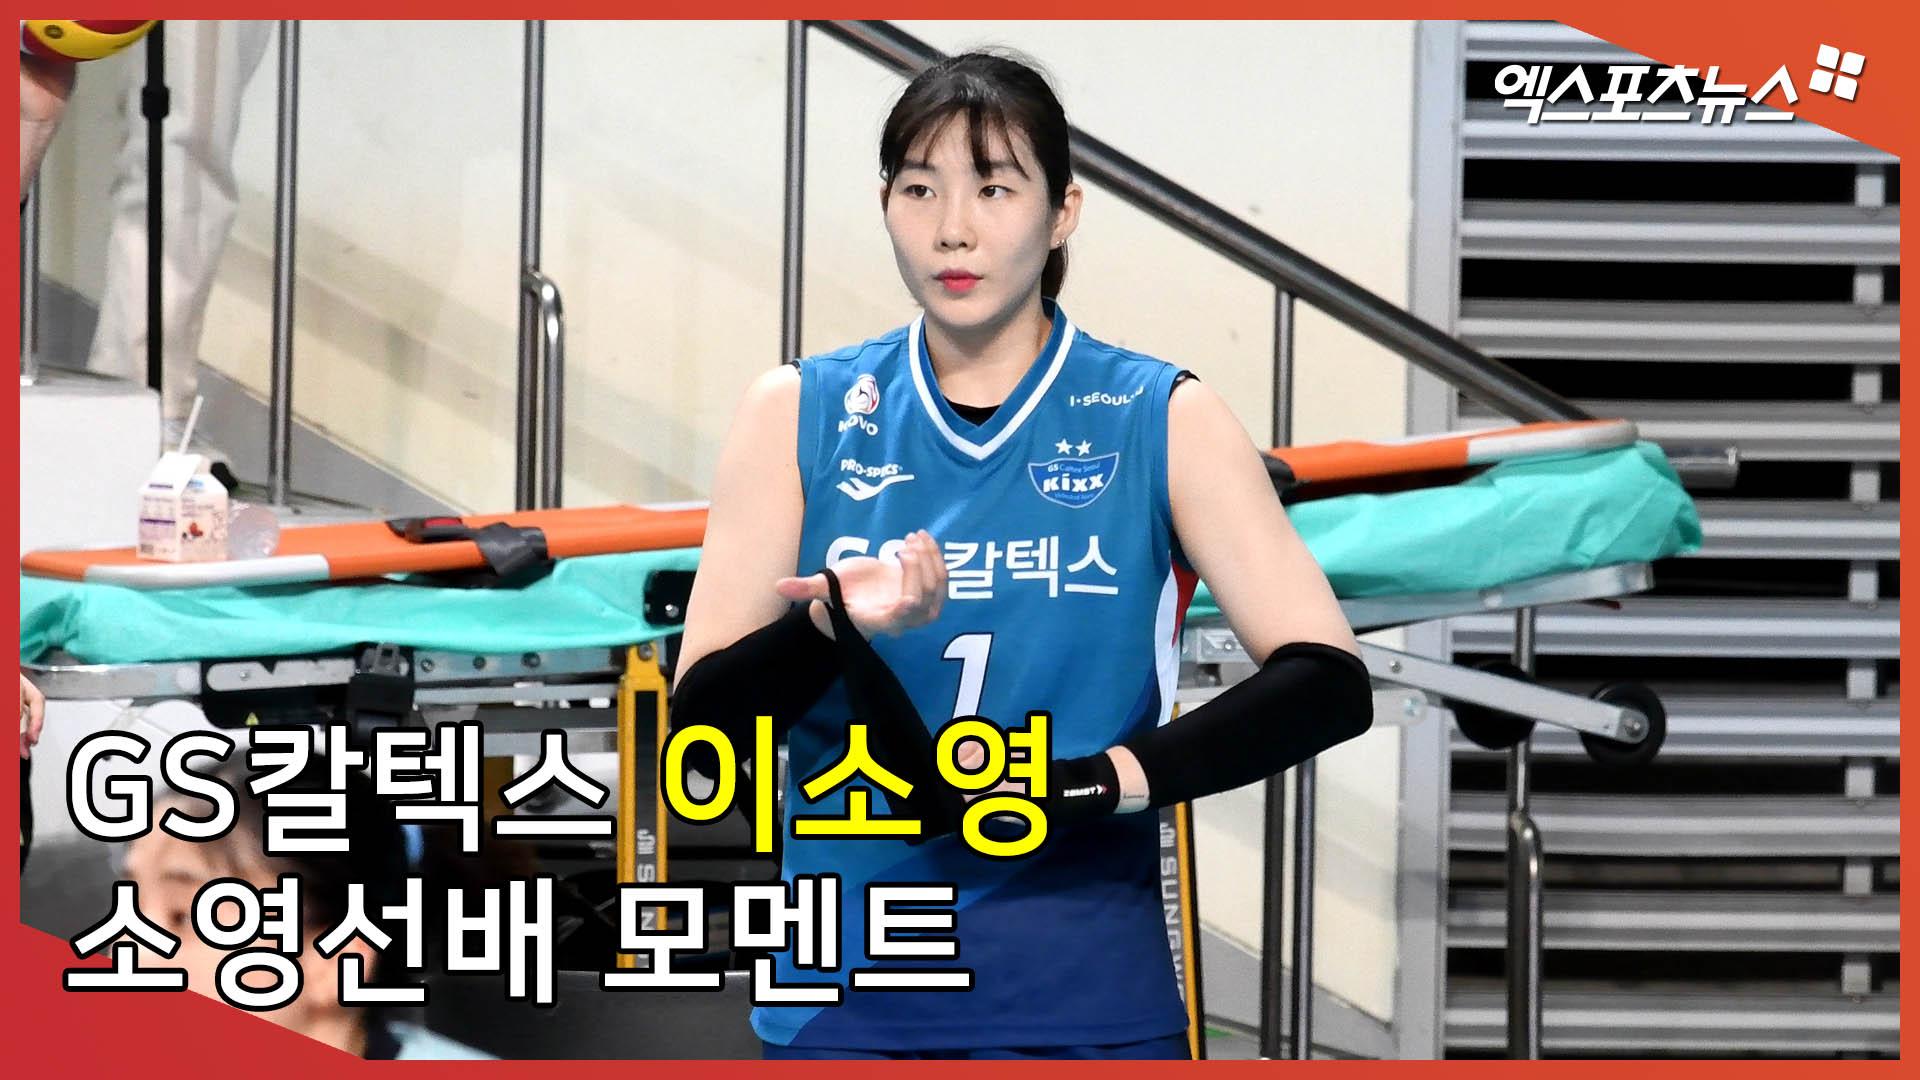 GS칼텍스 이소영, 이래서 반하는 '소영선배' 모멘트[엑's 영상]